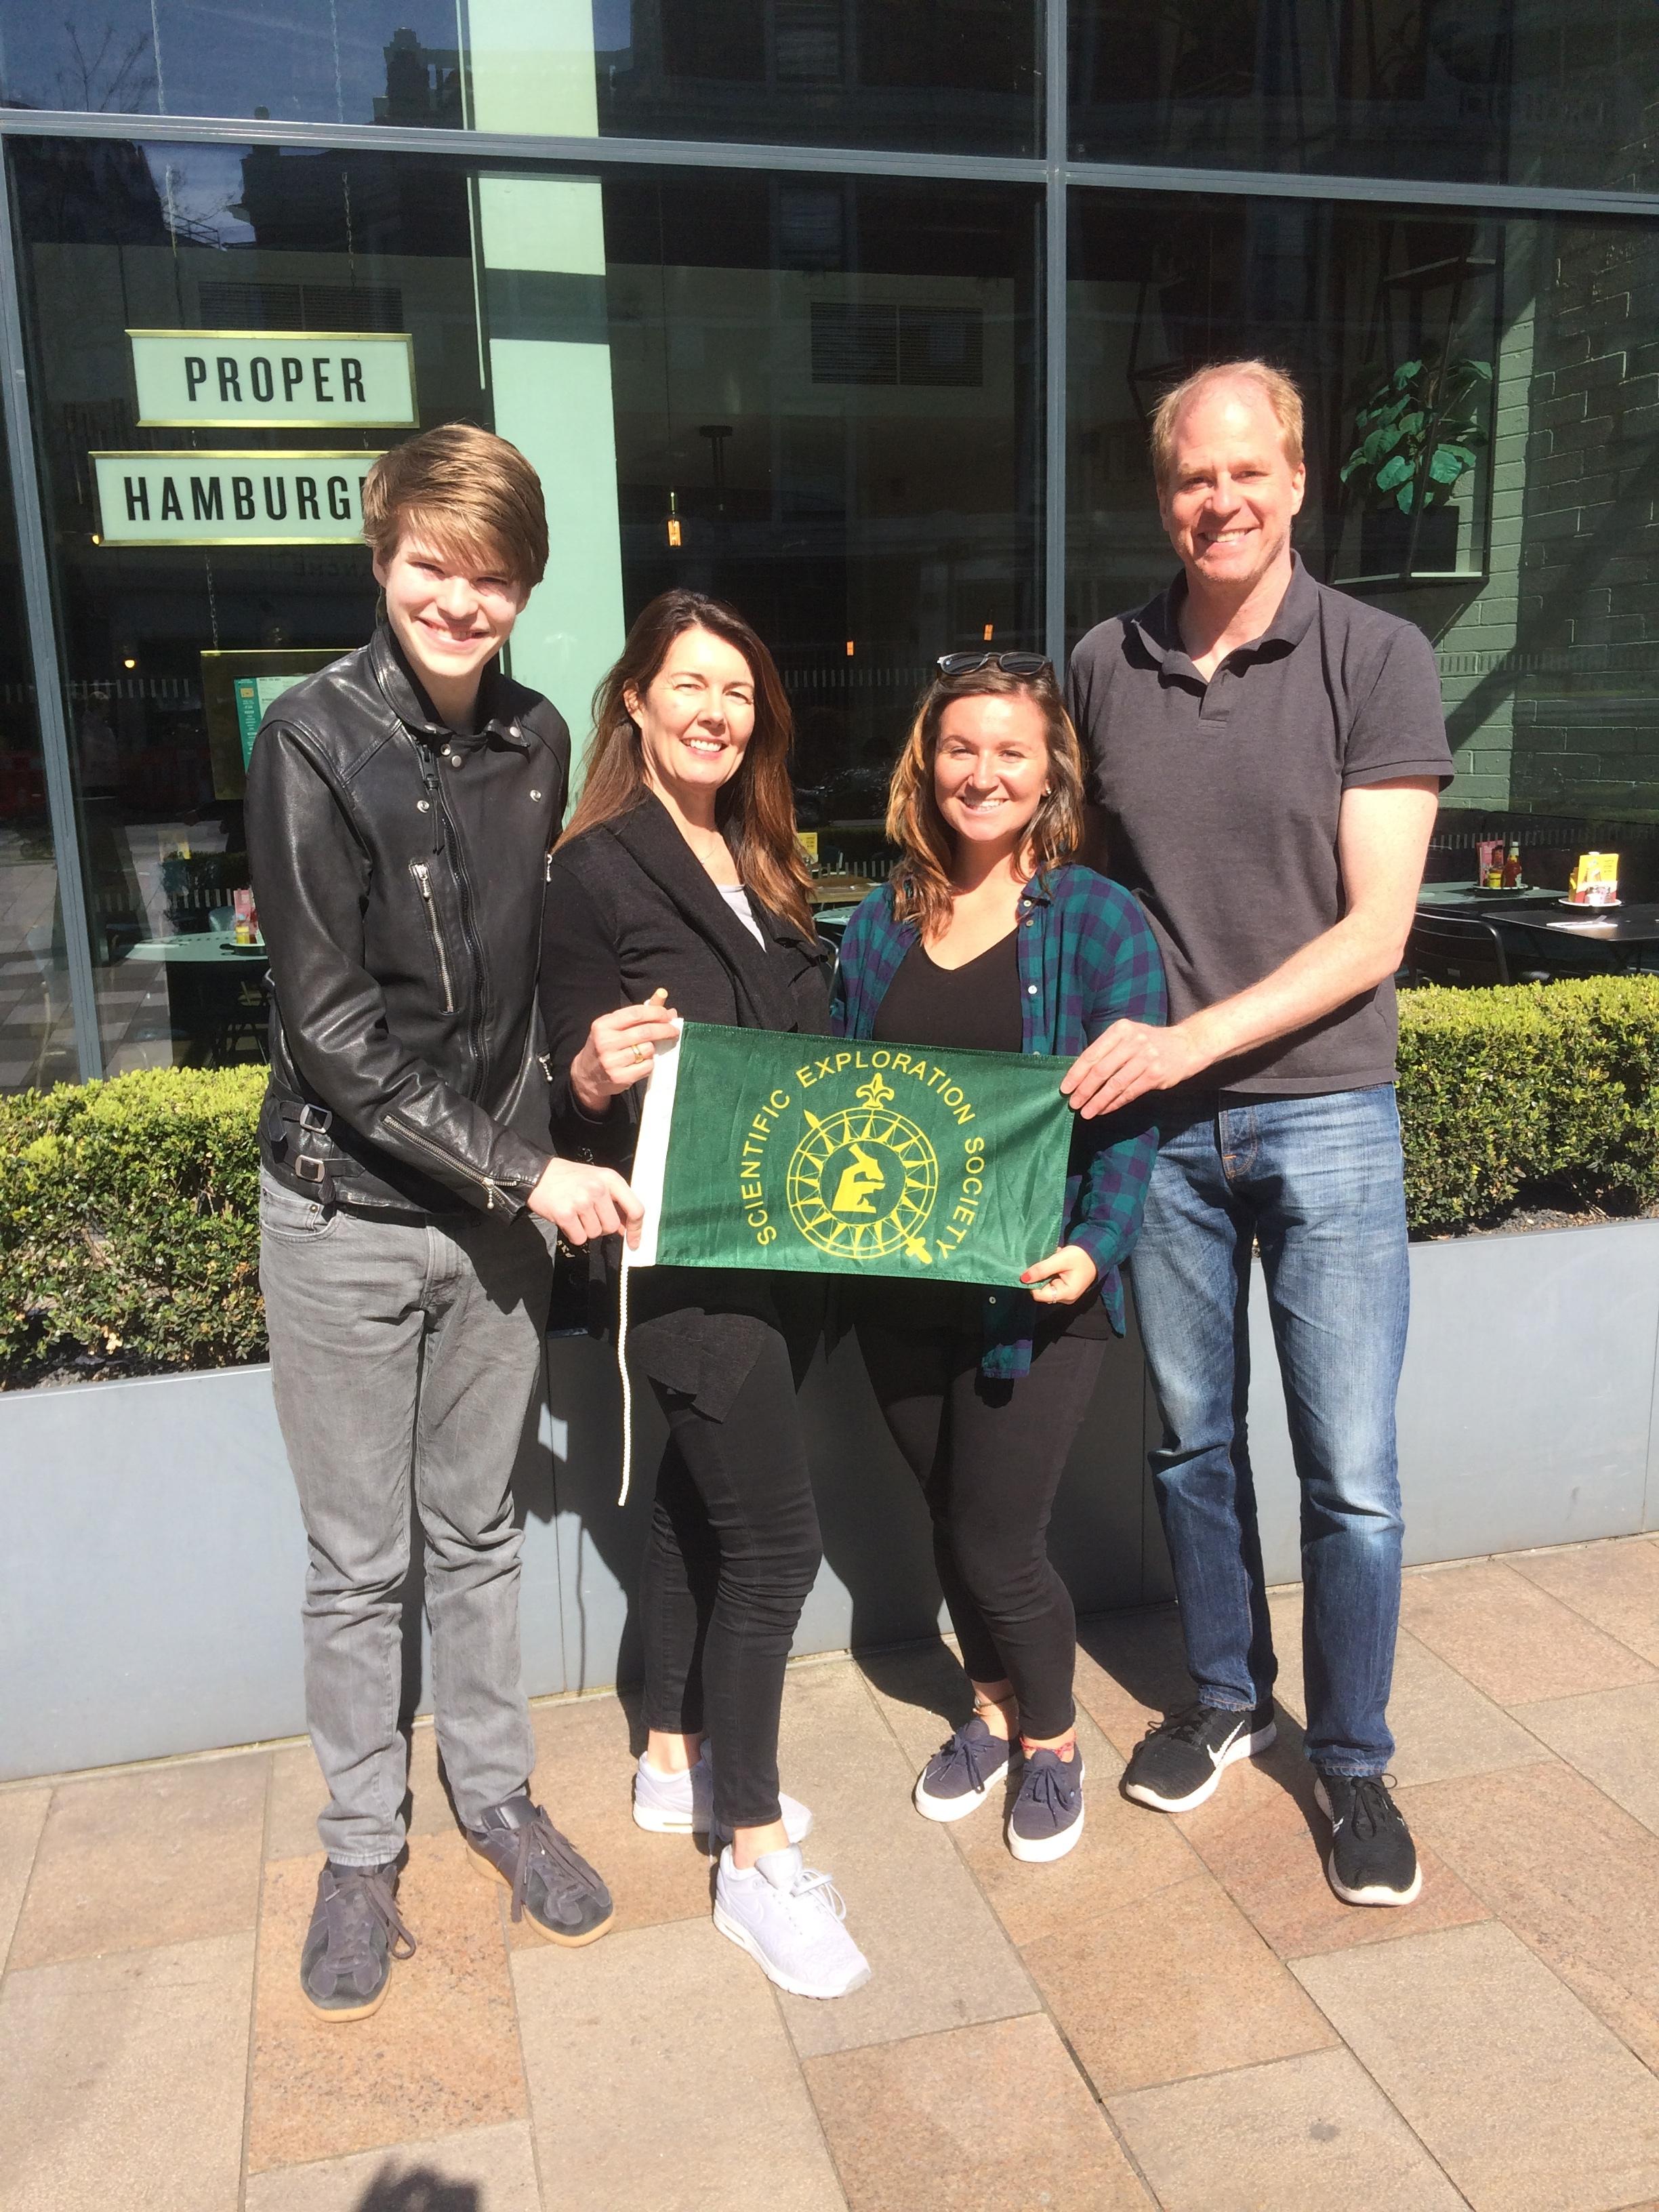 Elodies family presenting the SES flag to our new #pioneerwithpurpose Eleanor Flatt.